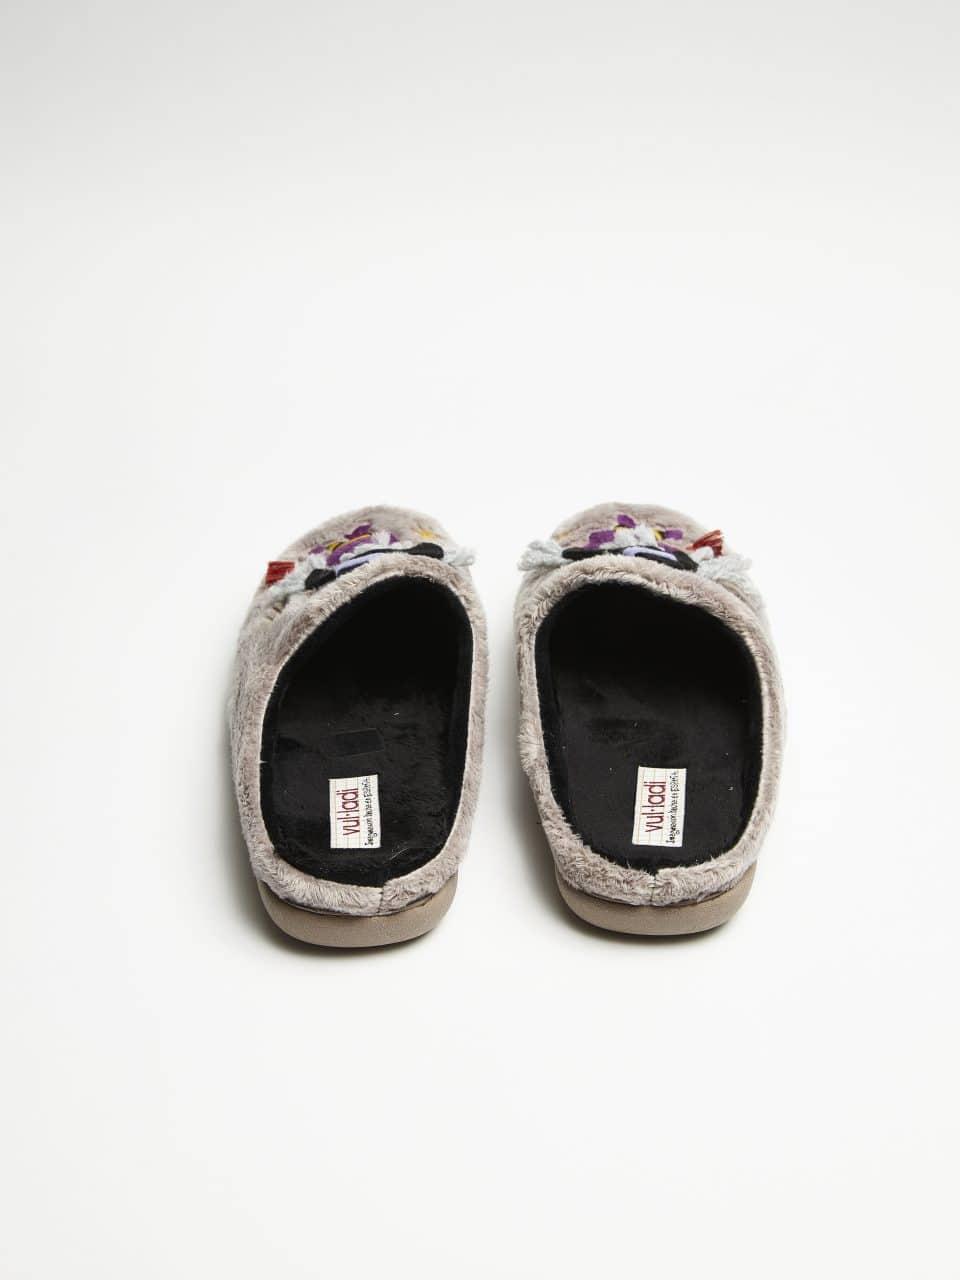 ZUECO BRUJA MONTBLANC PARDO Marcas en Loyna Shoes